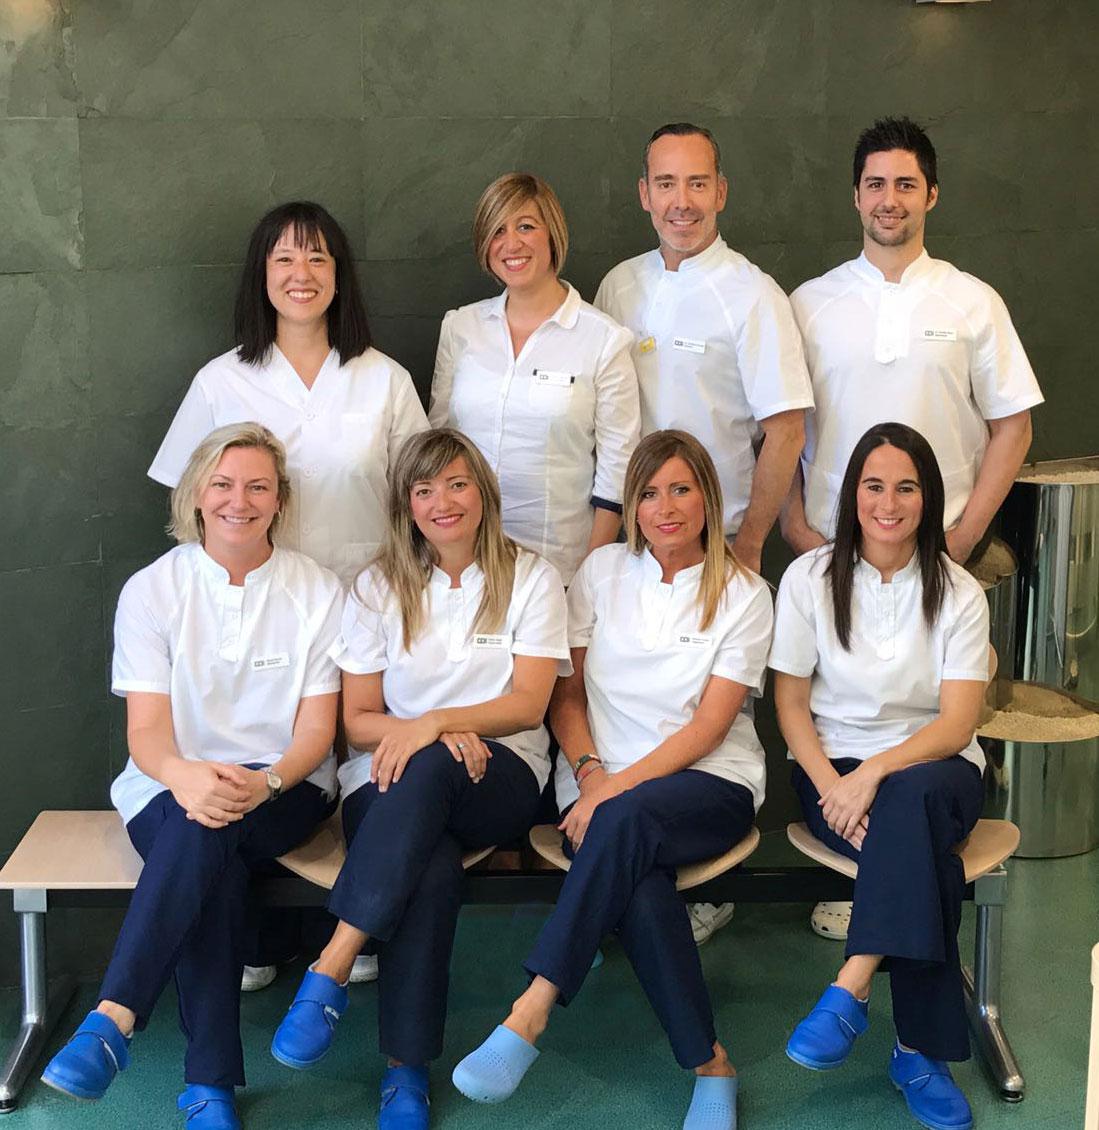 equipo clínica odontológica integral dr arias gijon